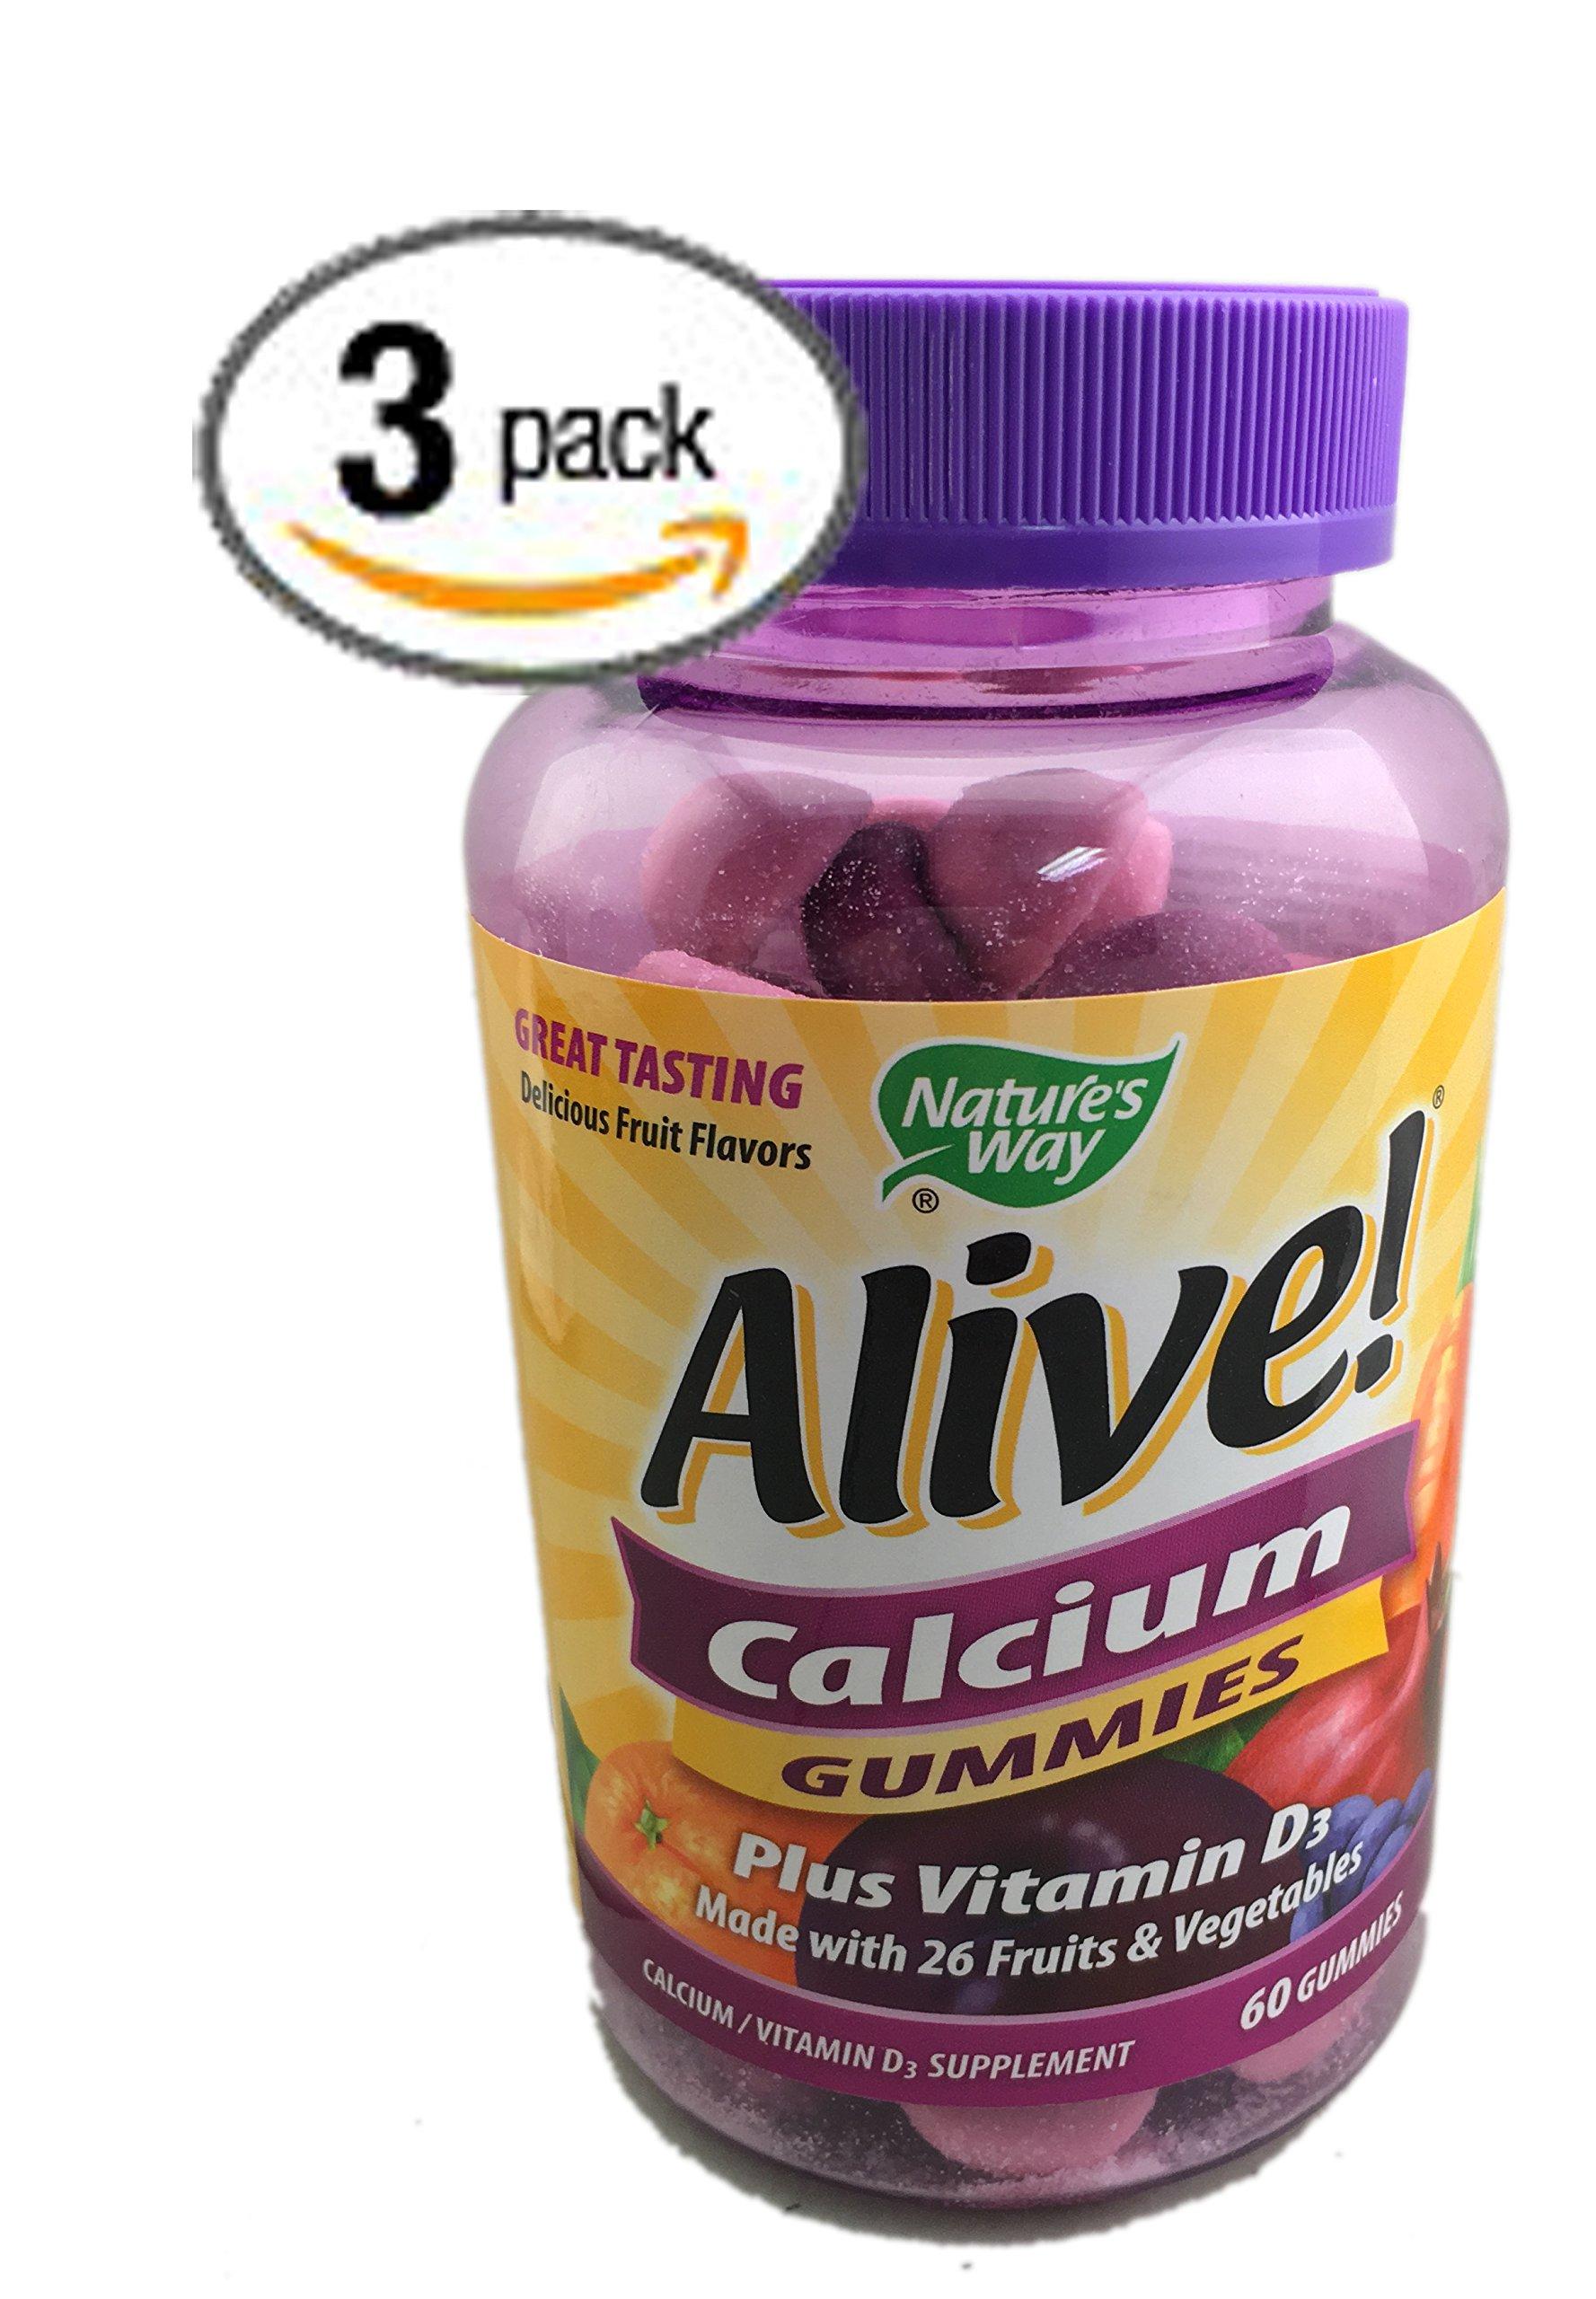 3-Pack Natures Way Alive! Calcium Gummies Plus Vitamin D3 - 60 Gummies Gluten Free and Vegetarian Friendly; 180 Calcium Gummies